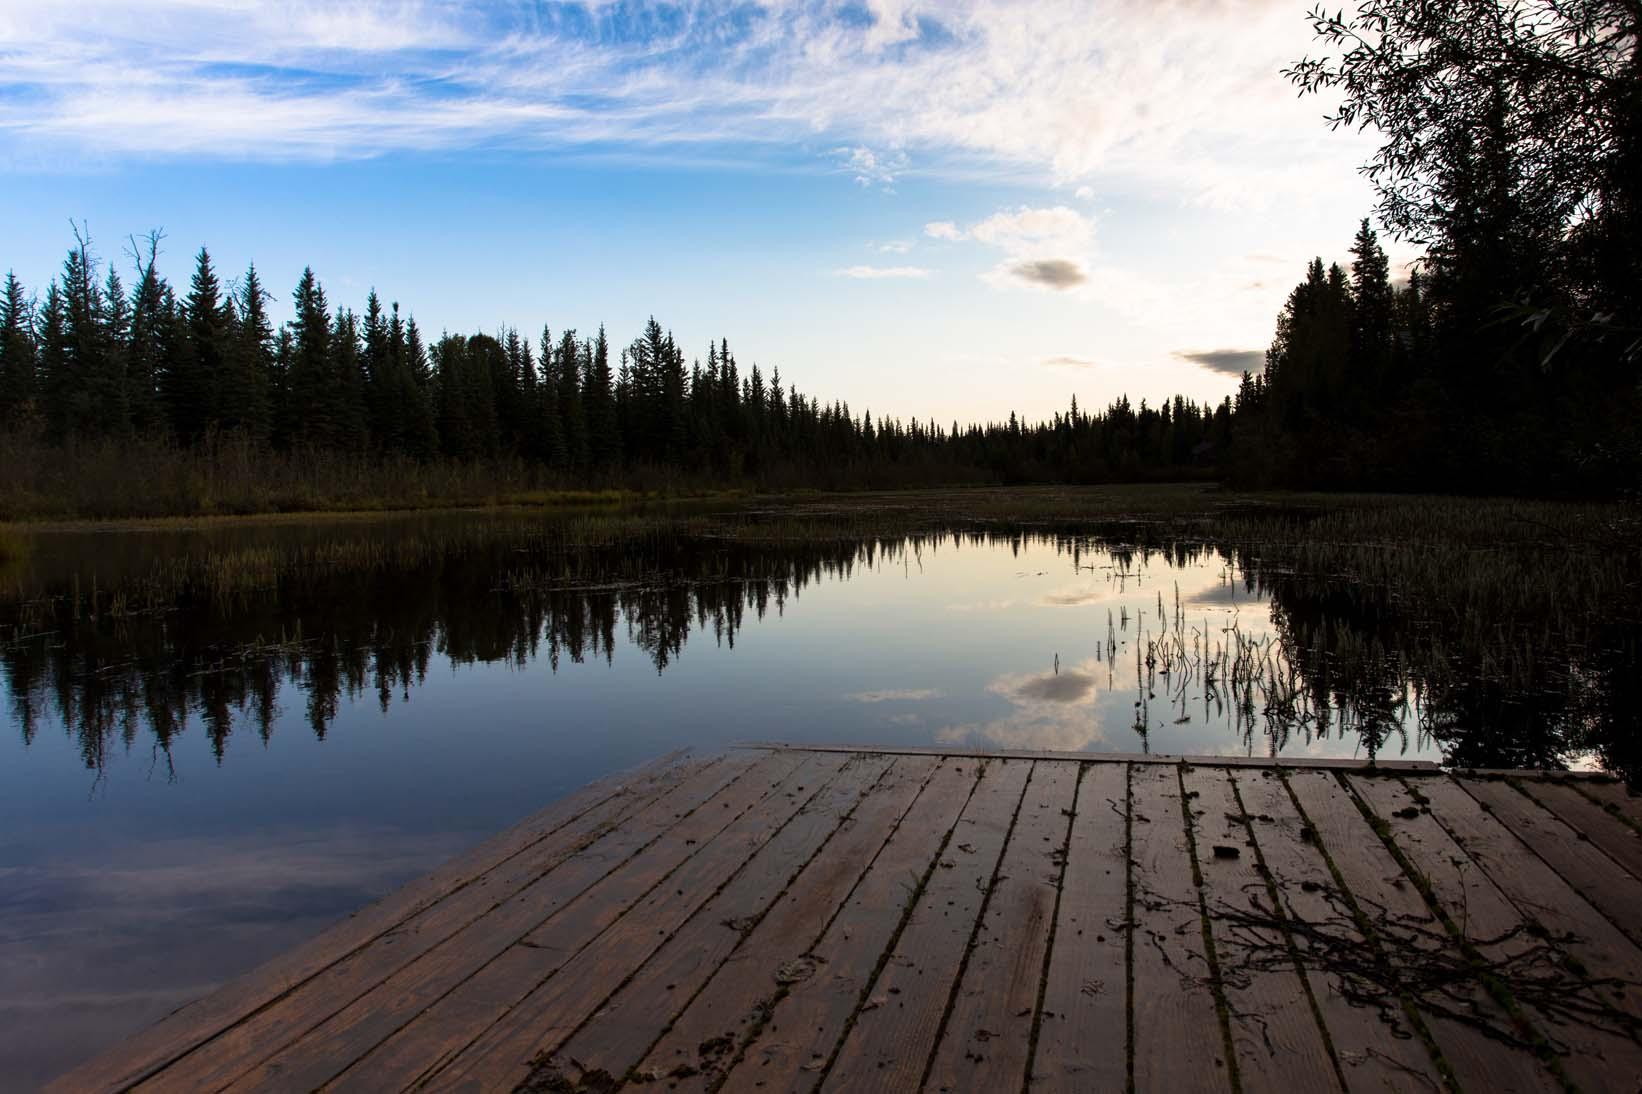 Day-07-Moose-Walk-Cabin-Chena-Slough-North-Pole-Alaska